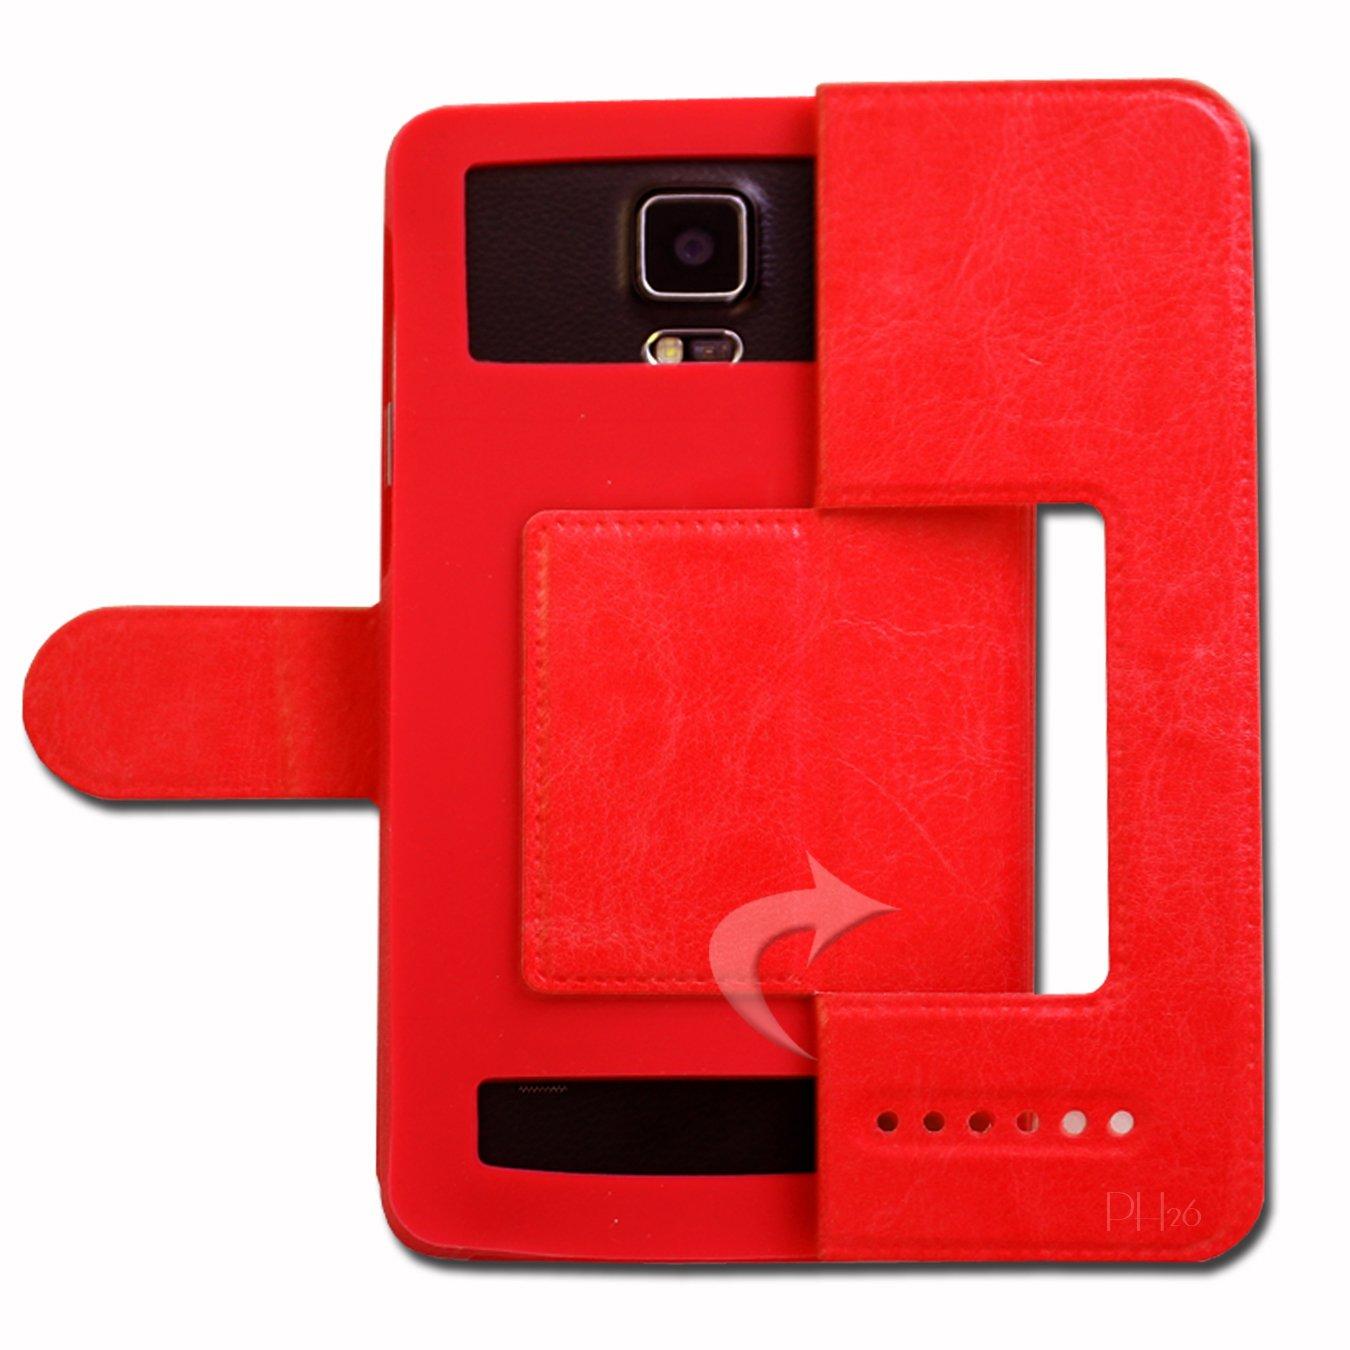 Ph26/® Thomson Friebdly TH101 Etui Housse Coque Folio rouge de qualit/é